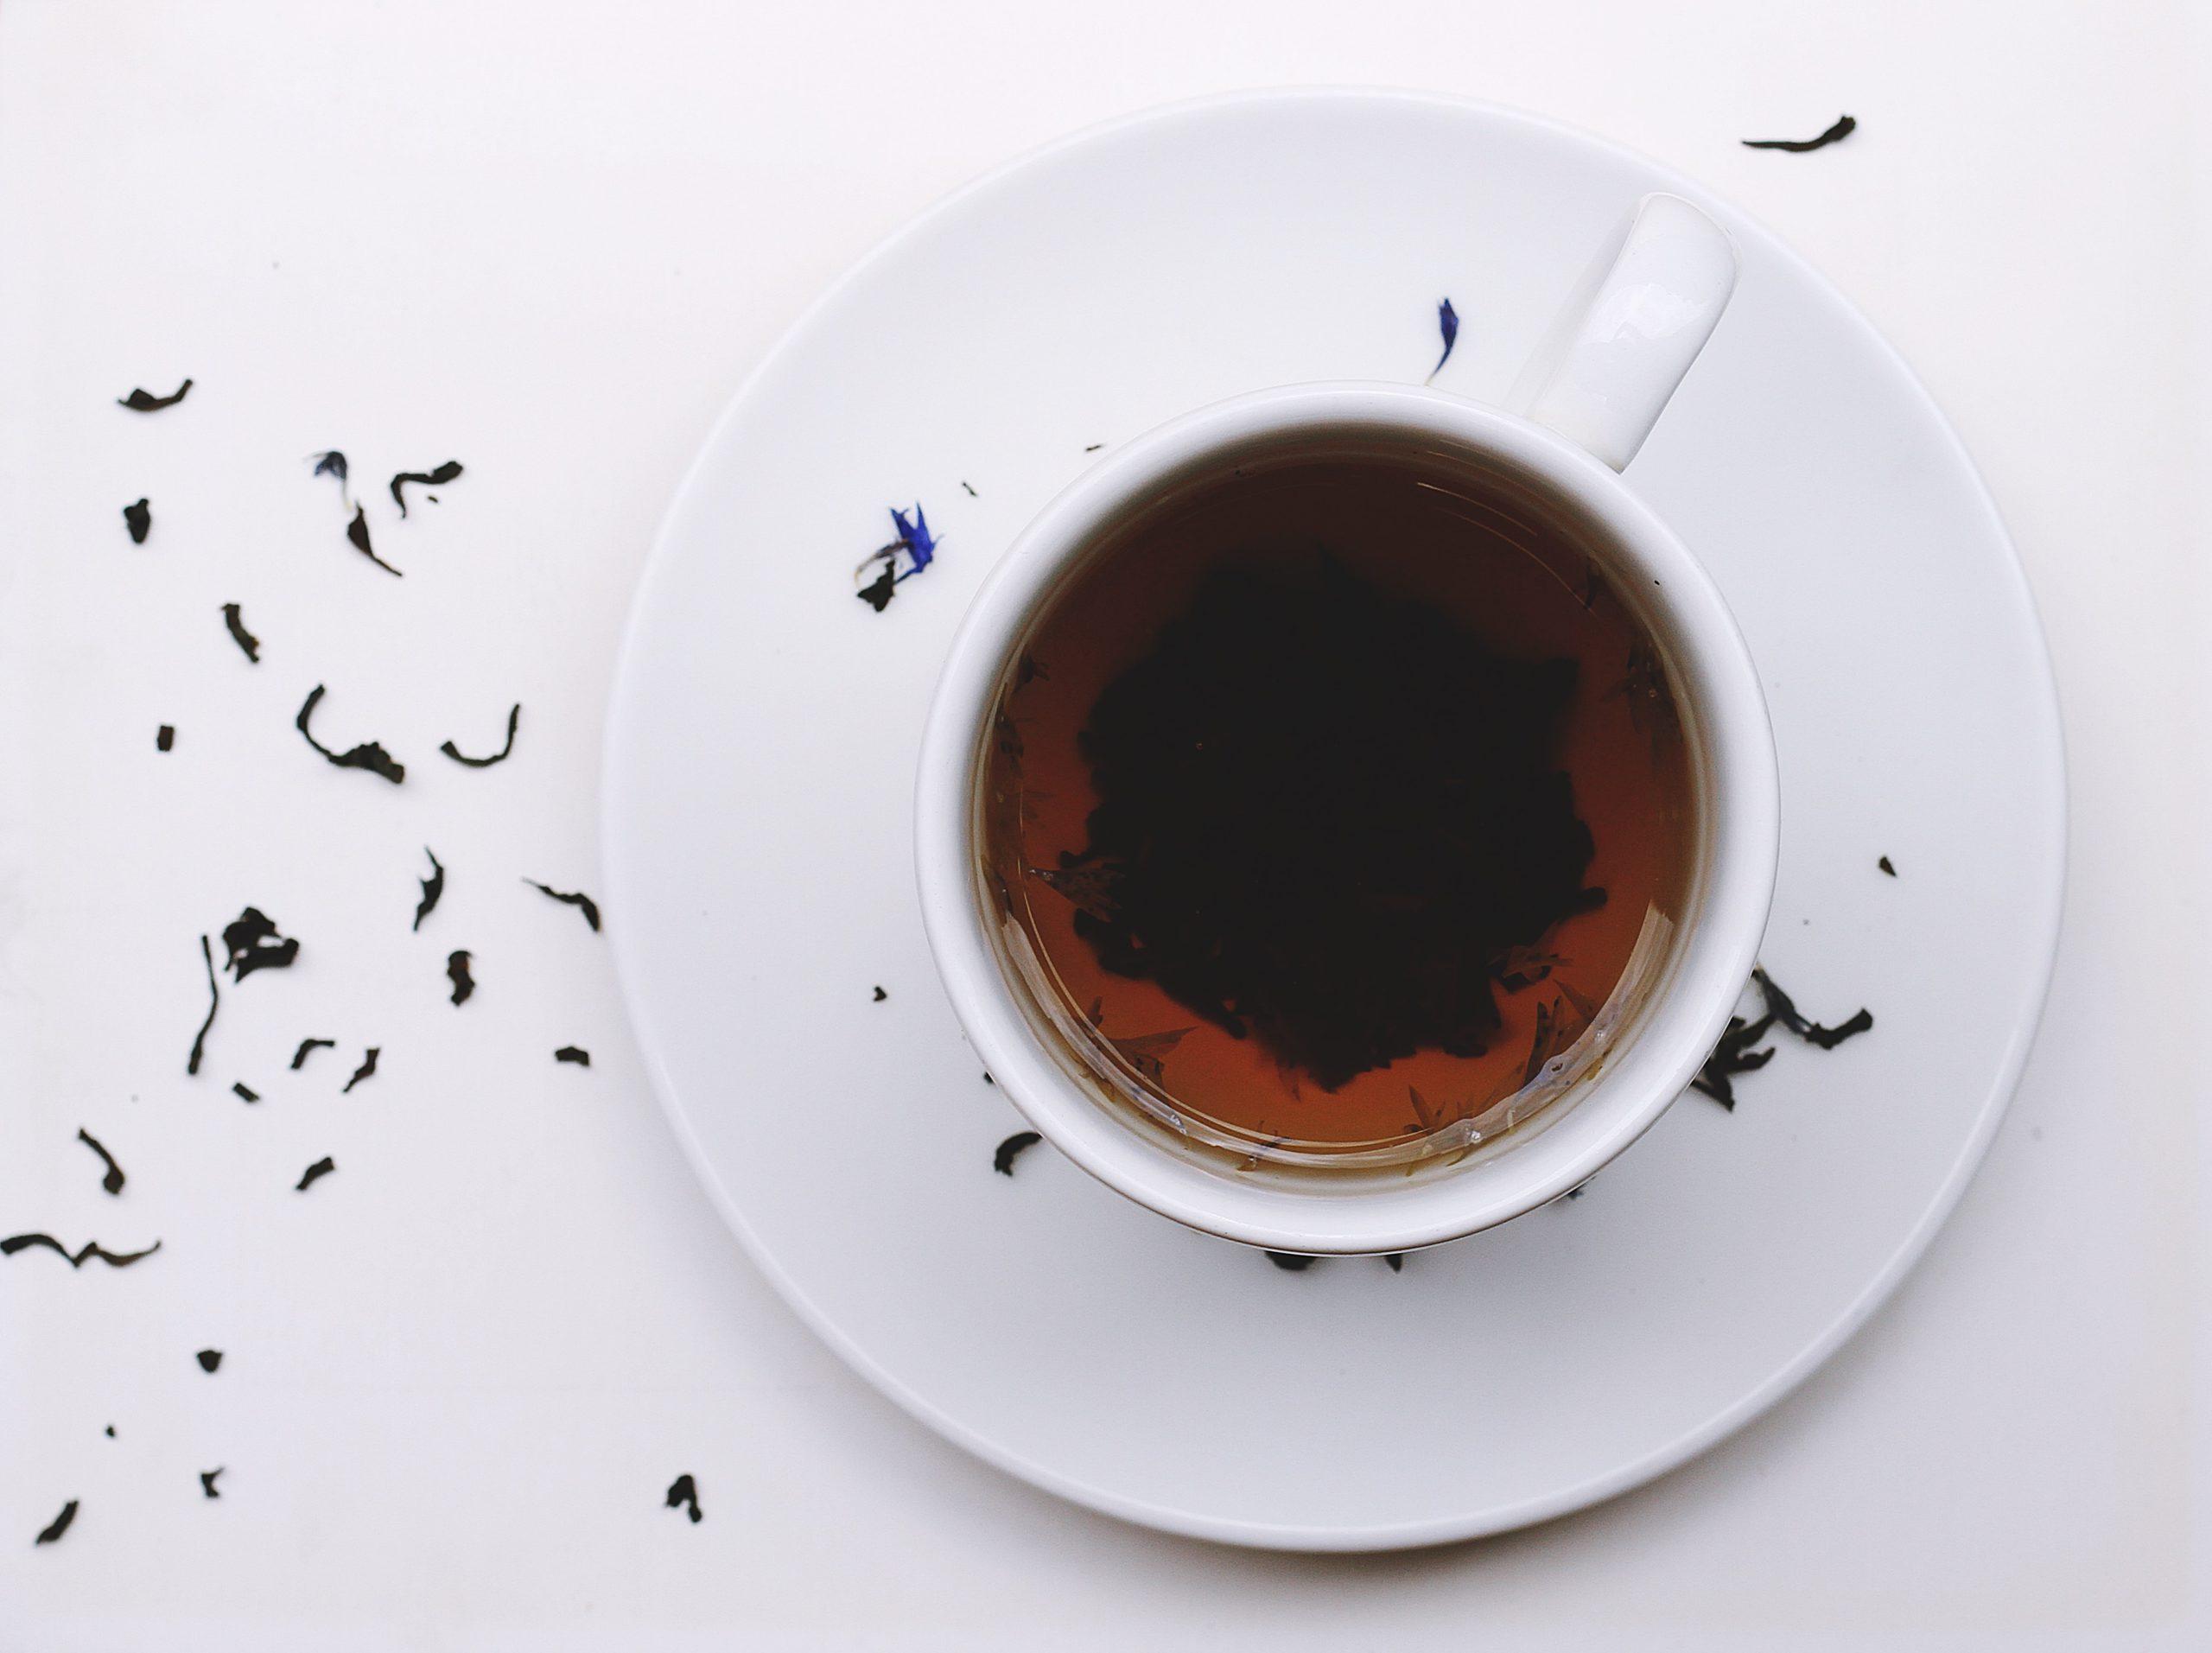 A photo of tea.